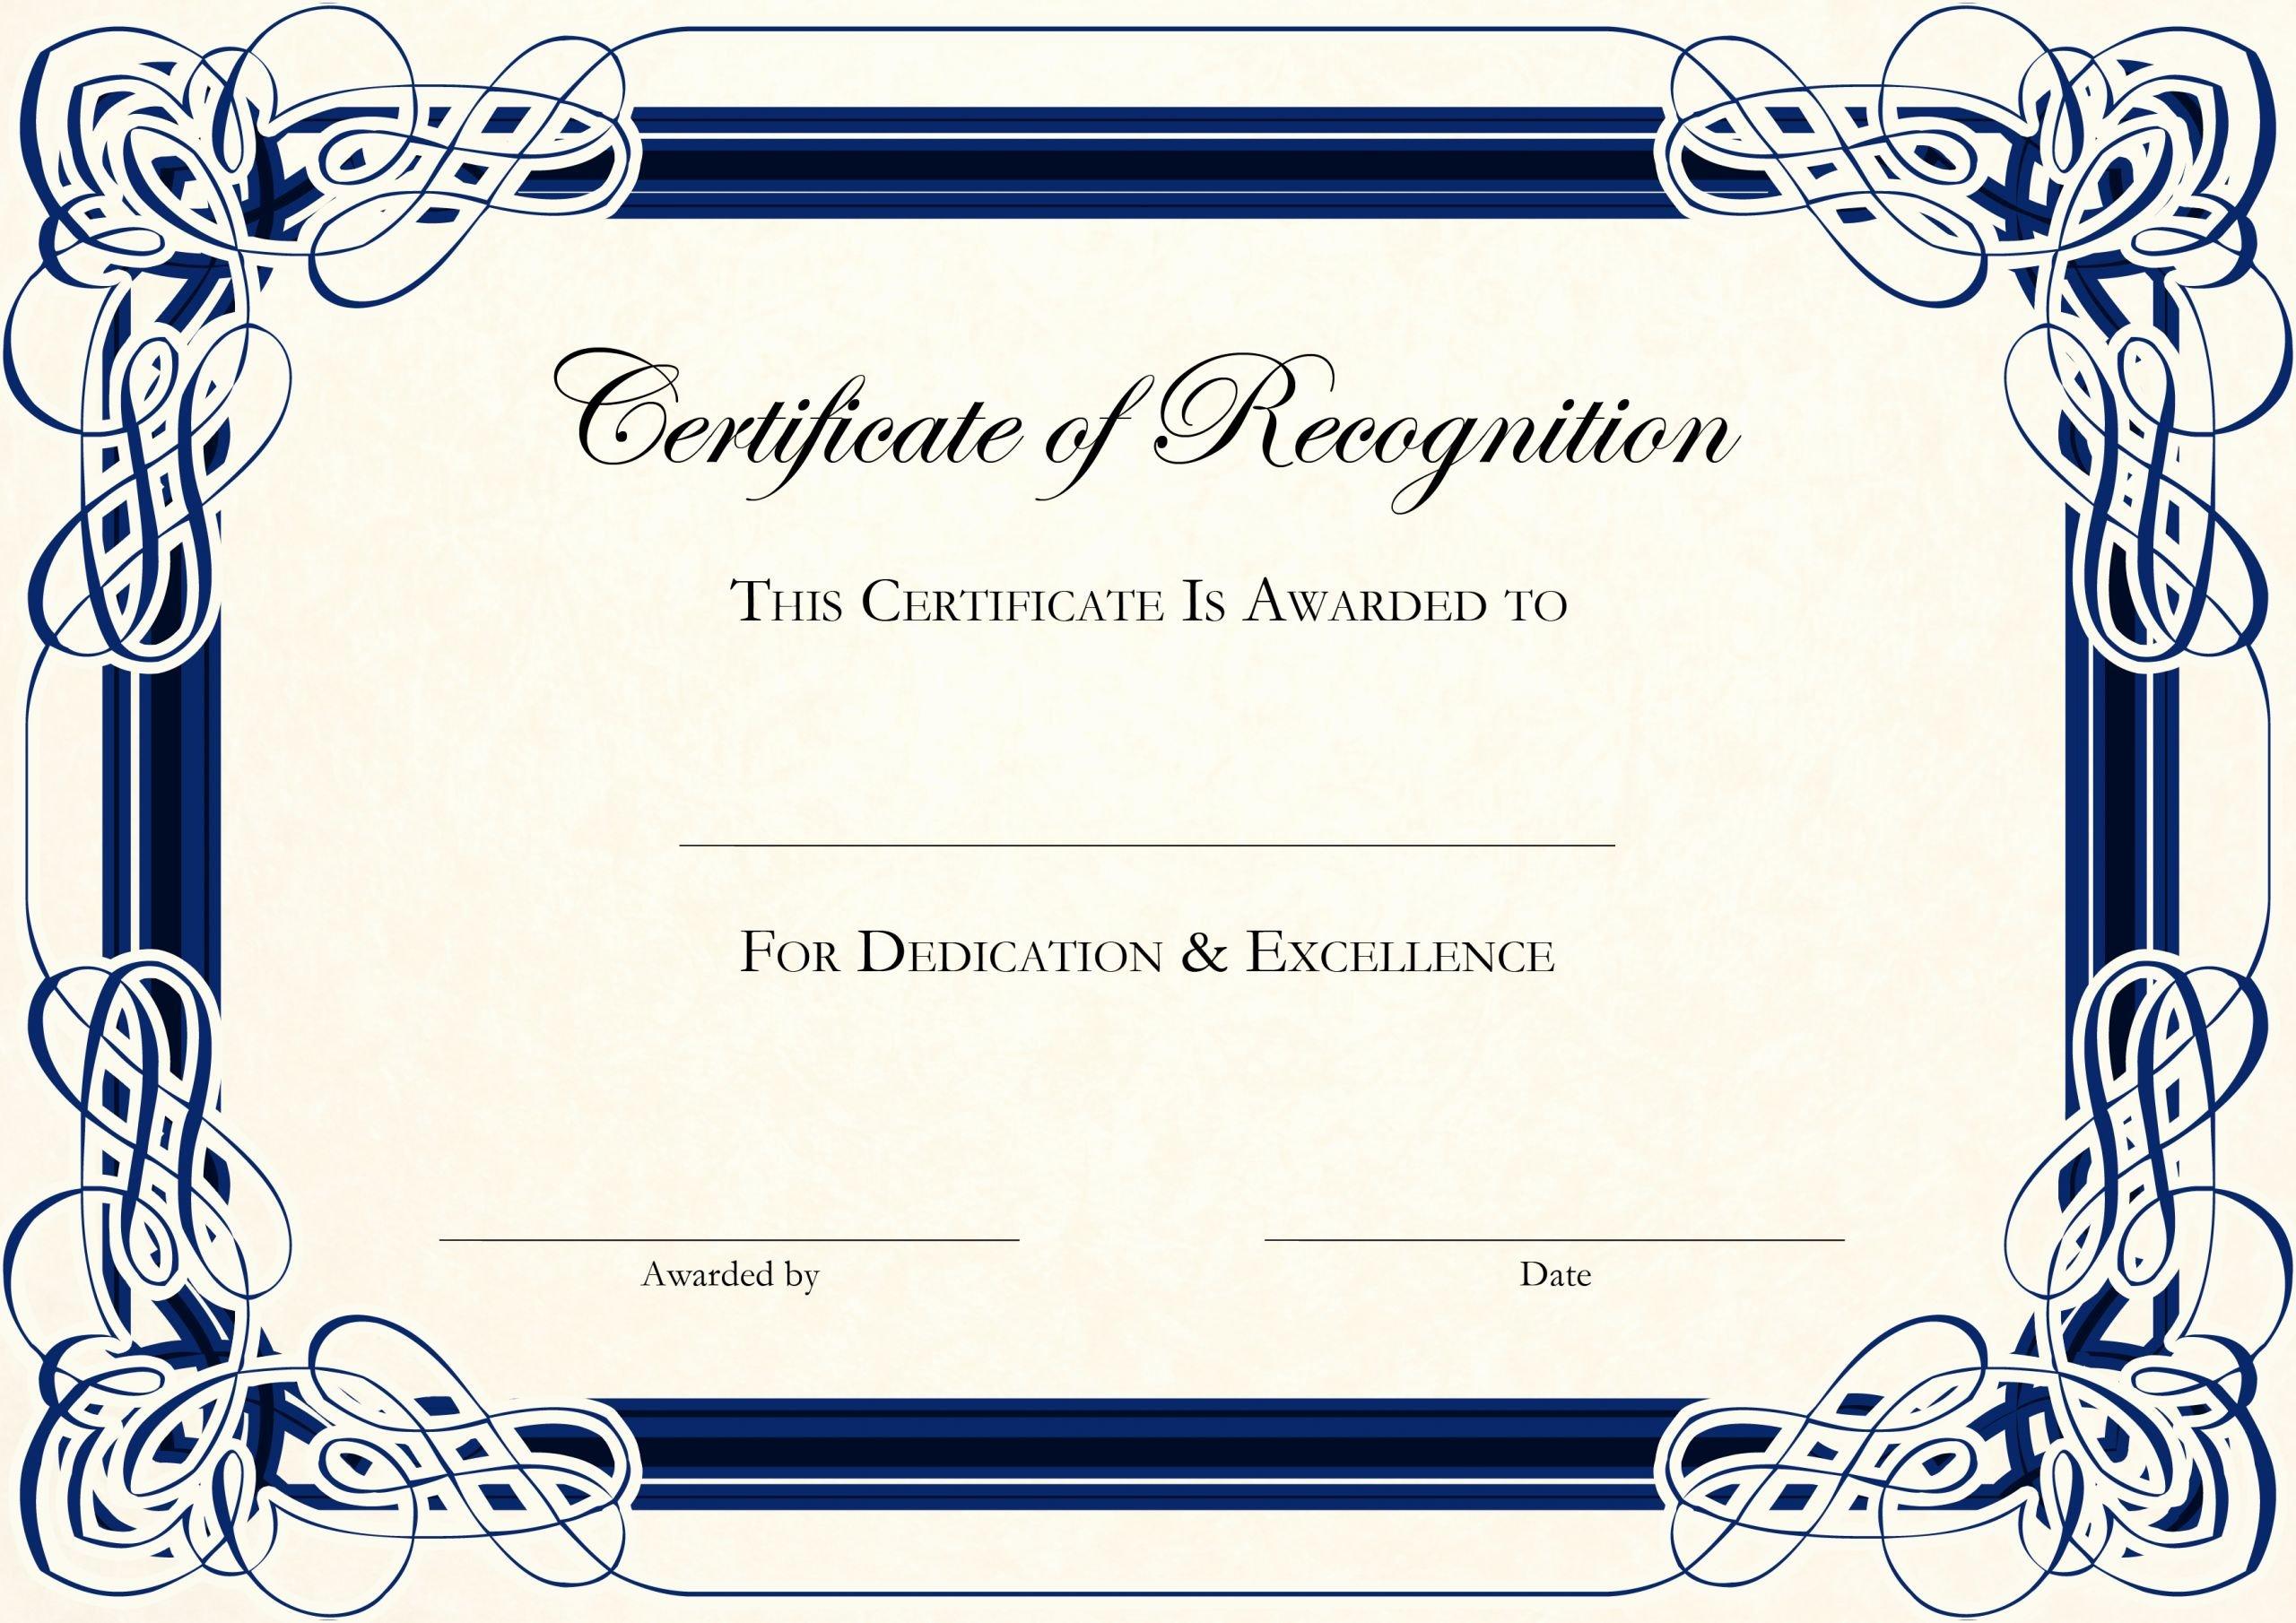 Award Certificate Clip Art Beautiful Certificate Template Free Download Clip Art